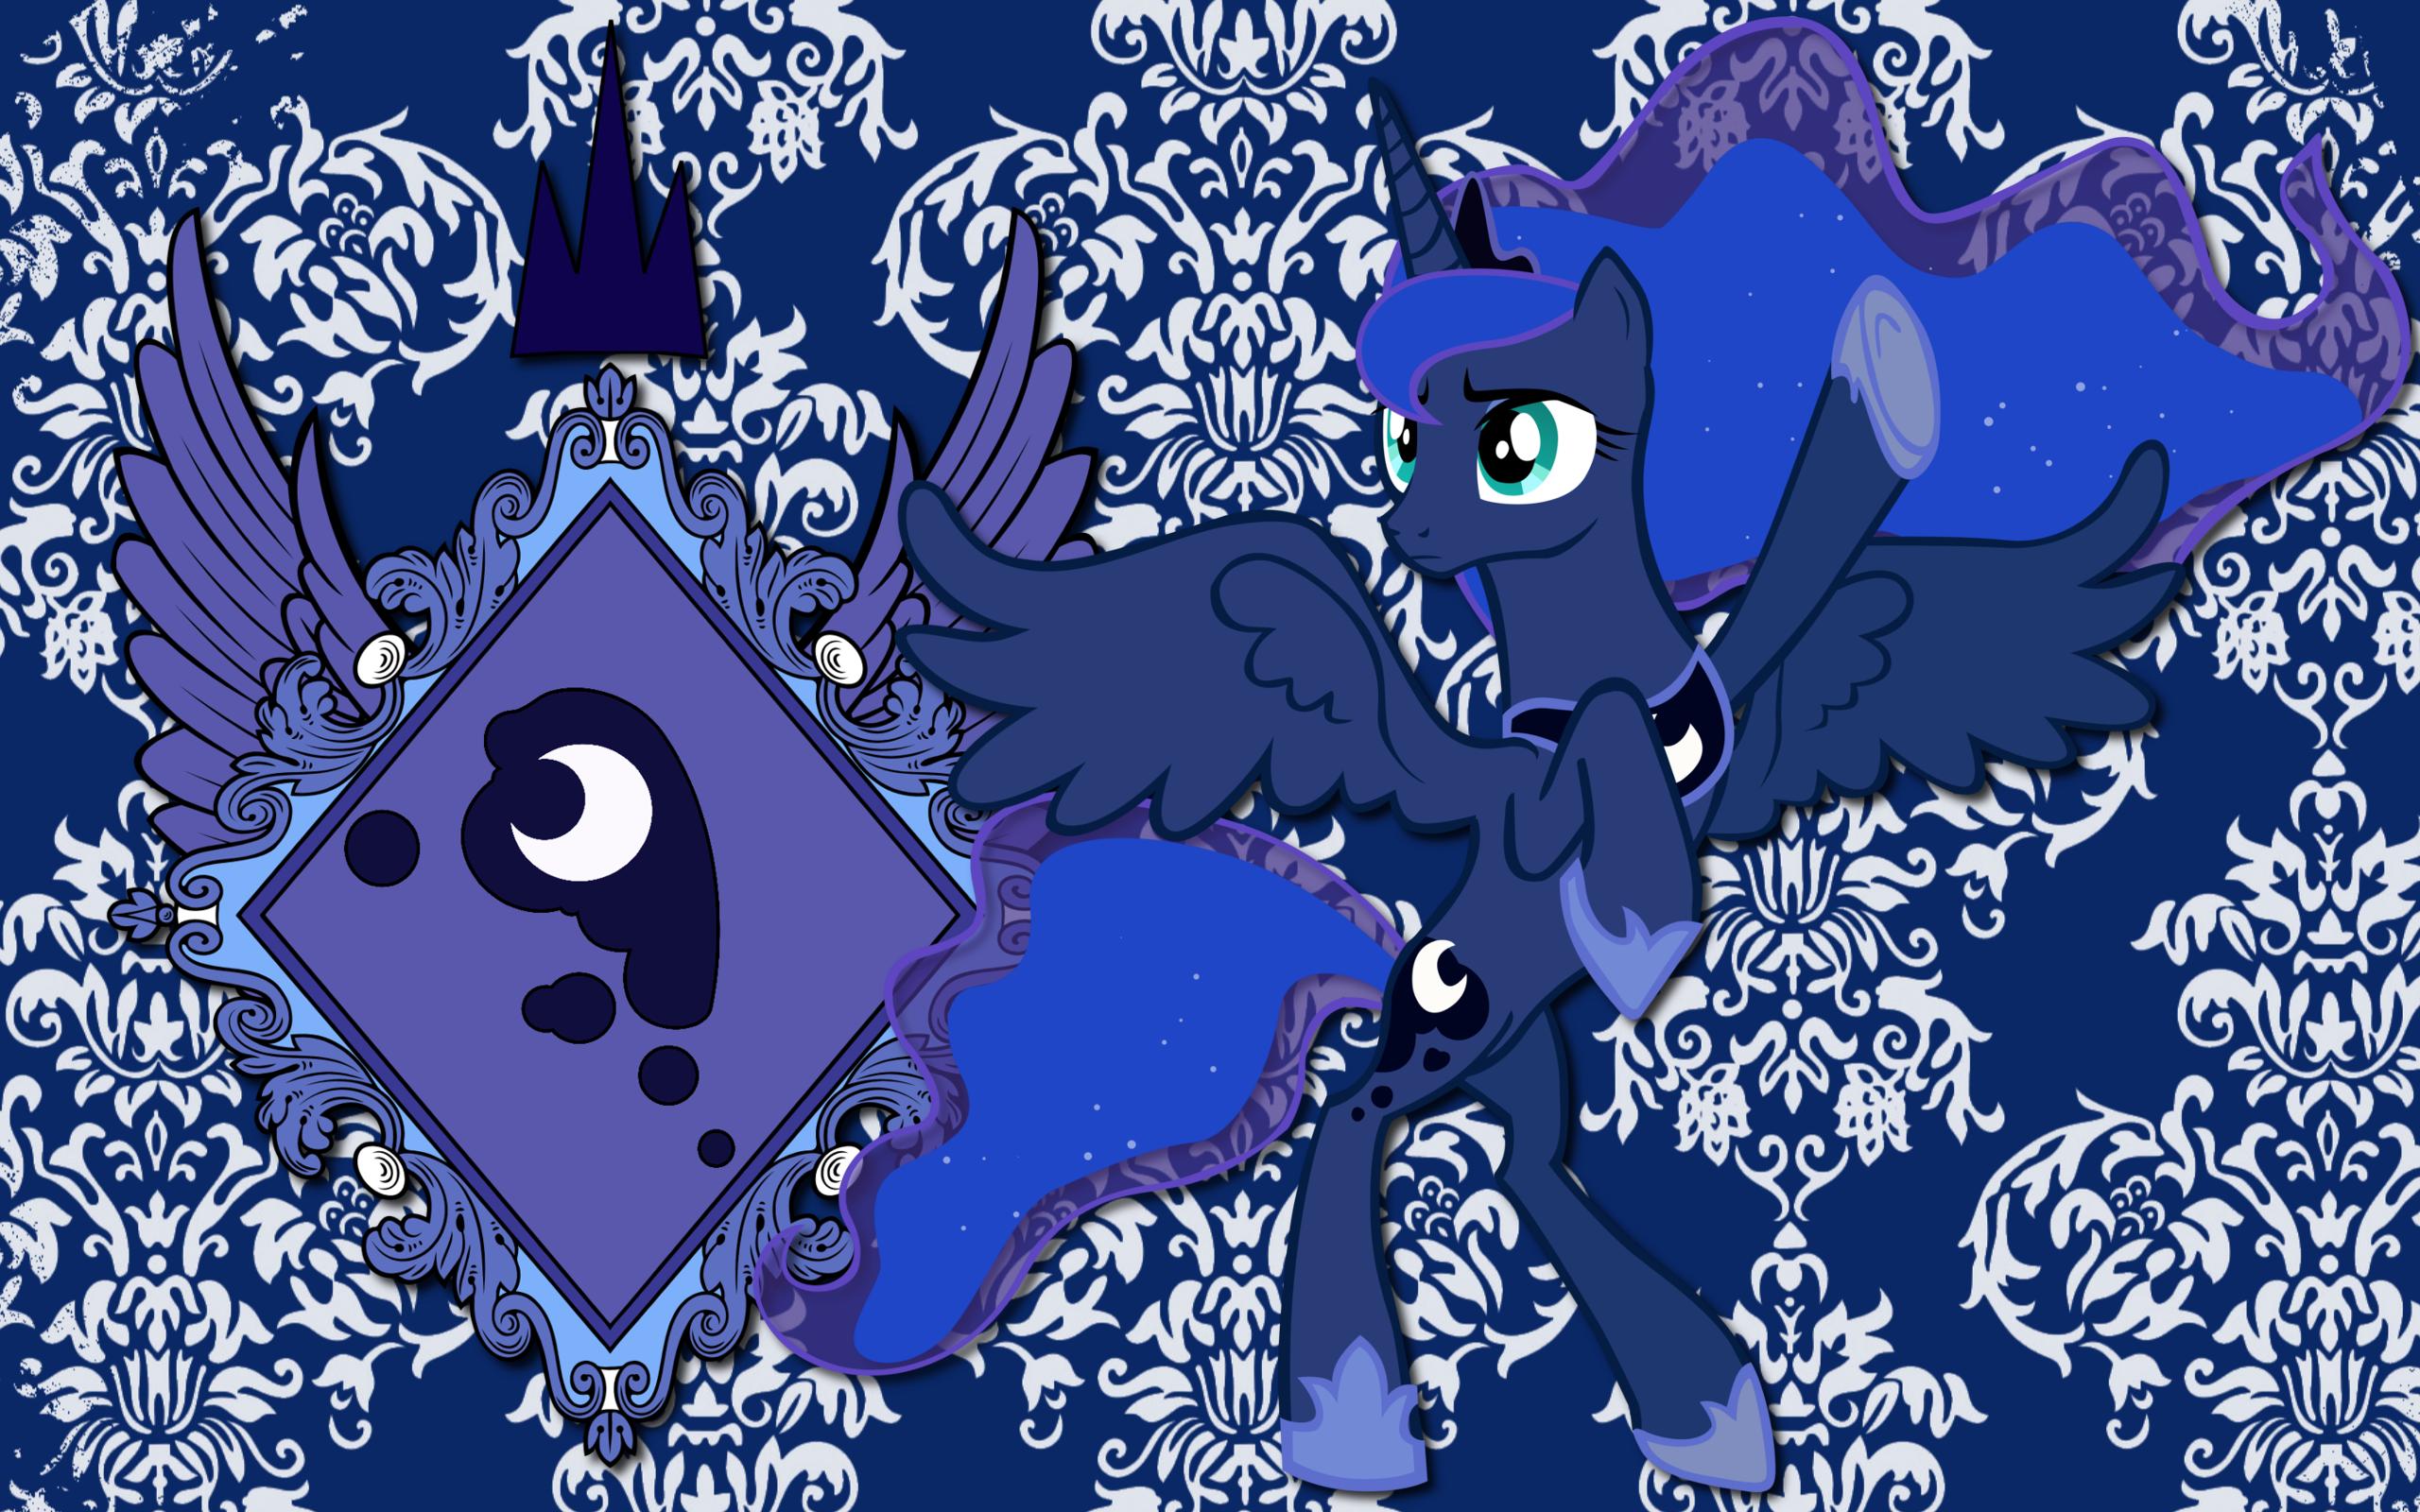 Princess Luna CoA WP by AliceHumanSacrifice0, Lord-Giampietro and Somepony